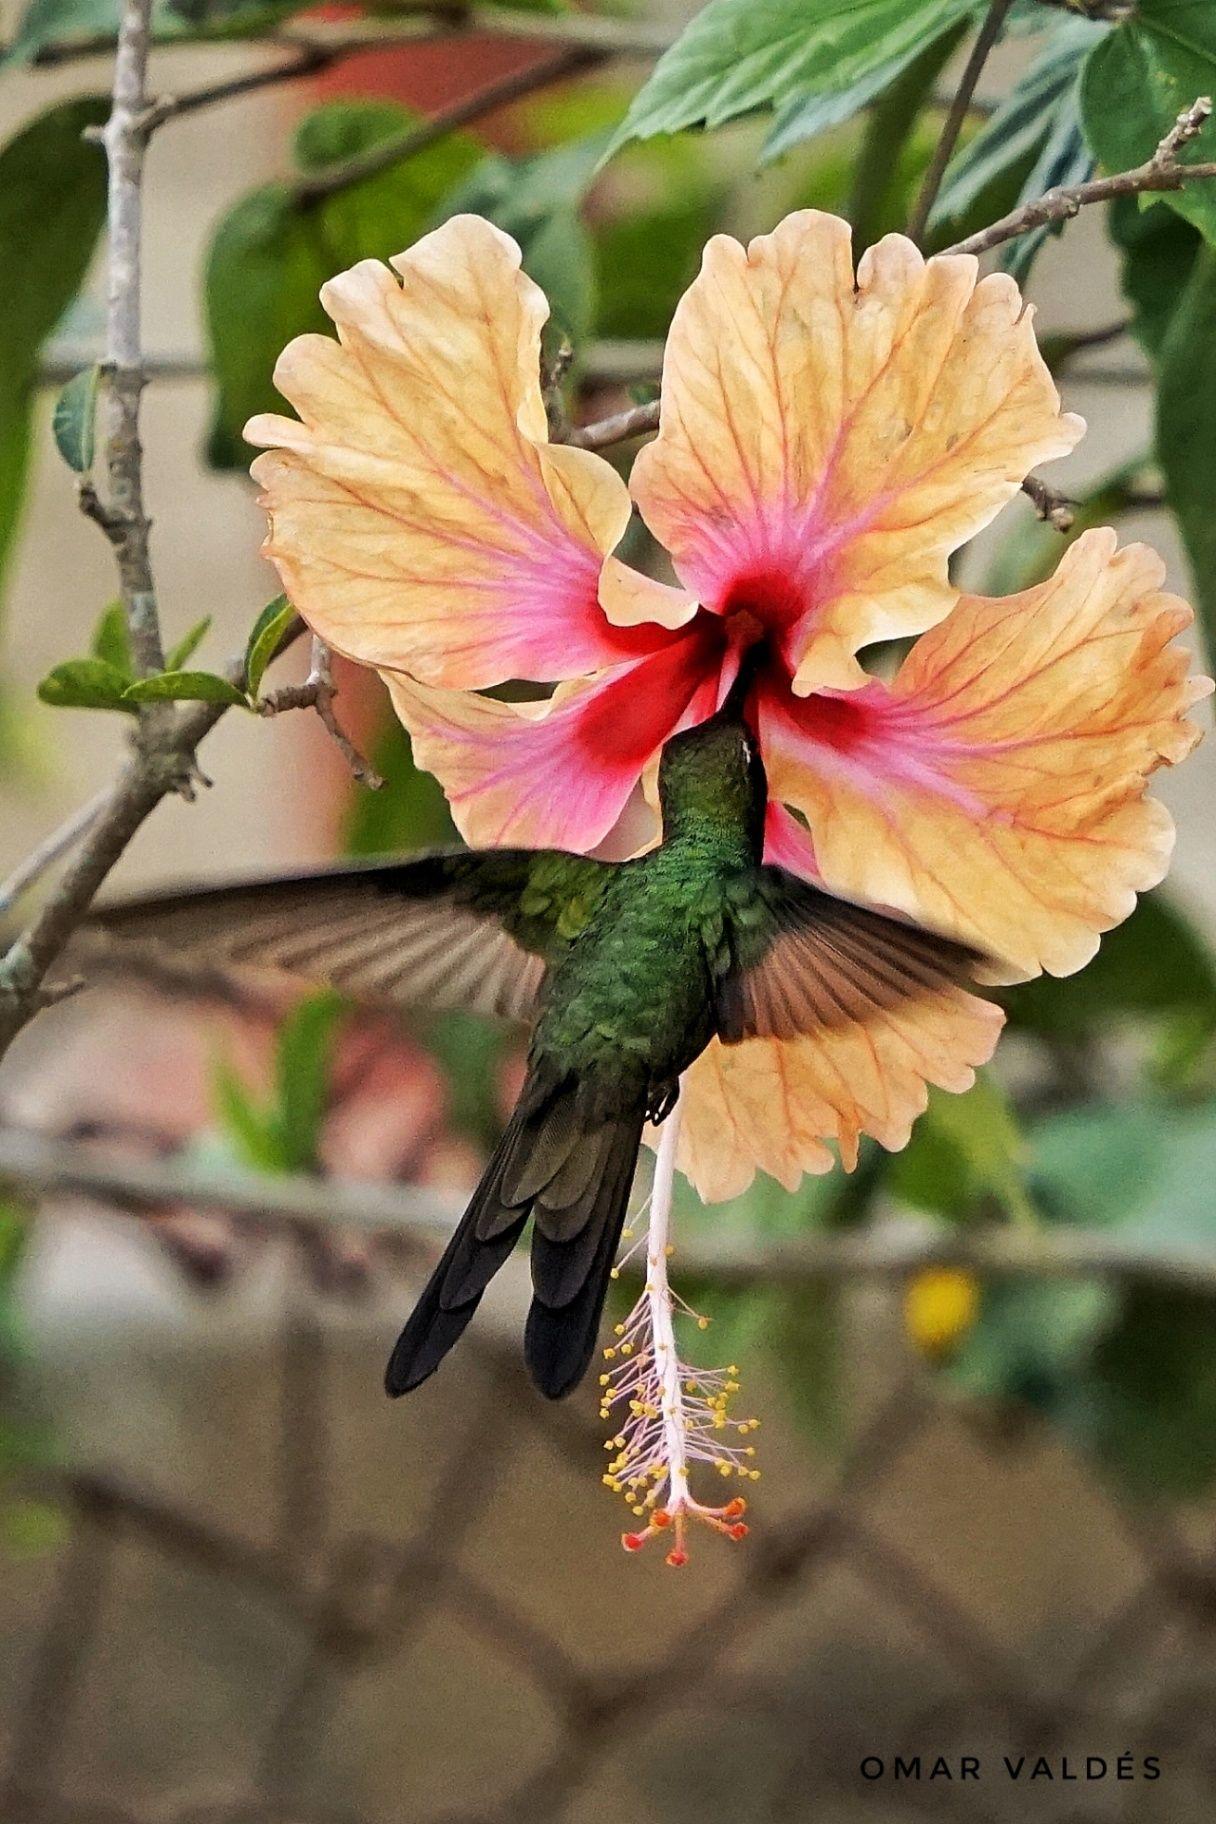 Obra: Zunzun flying. Endemic bird